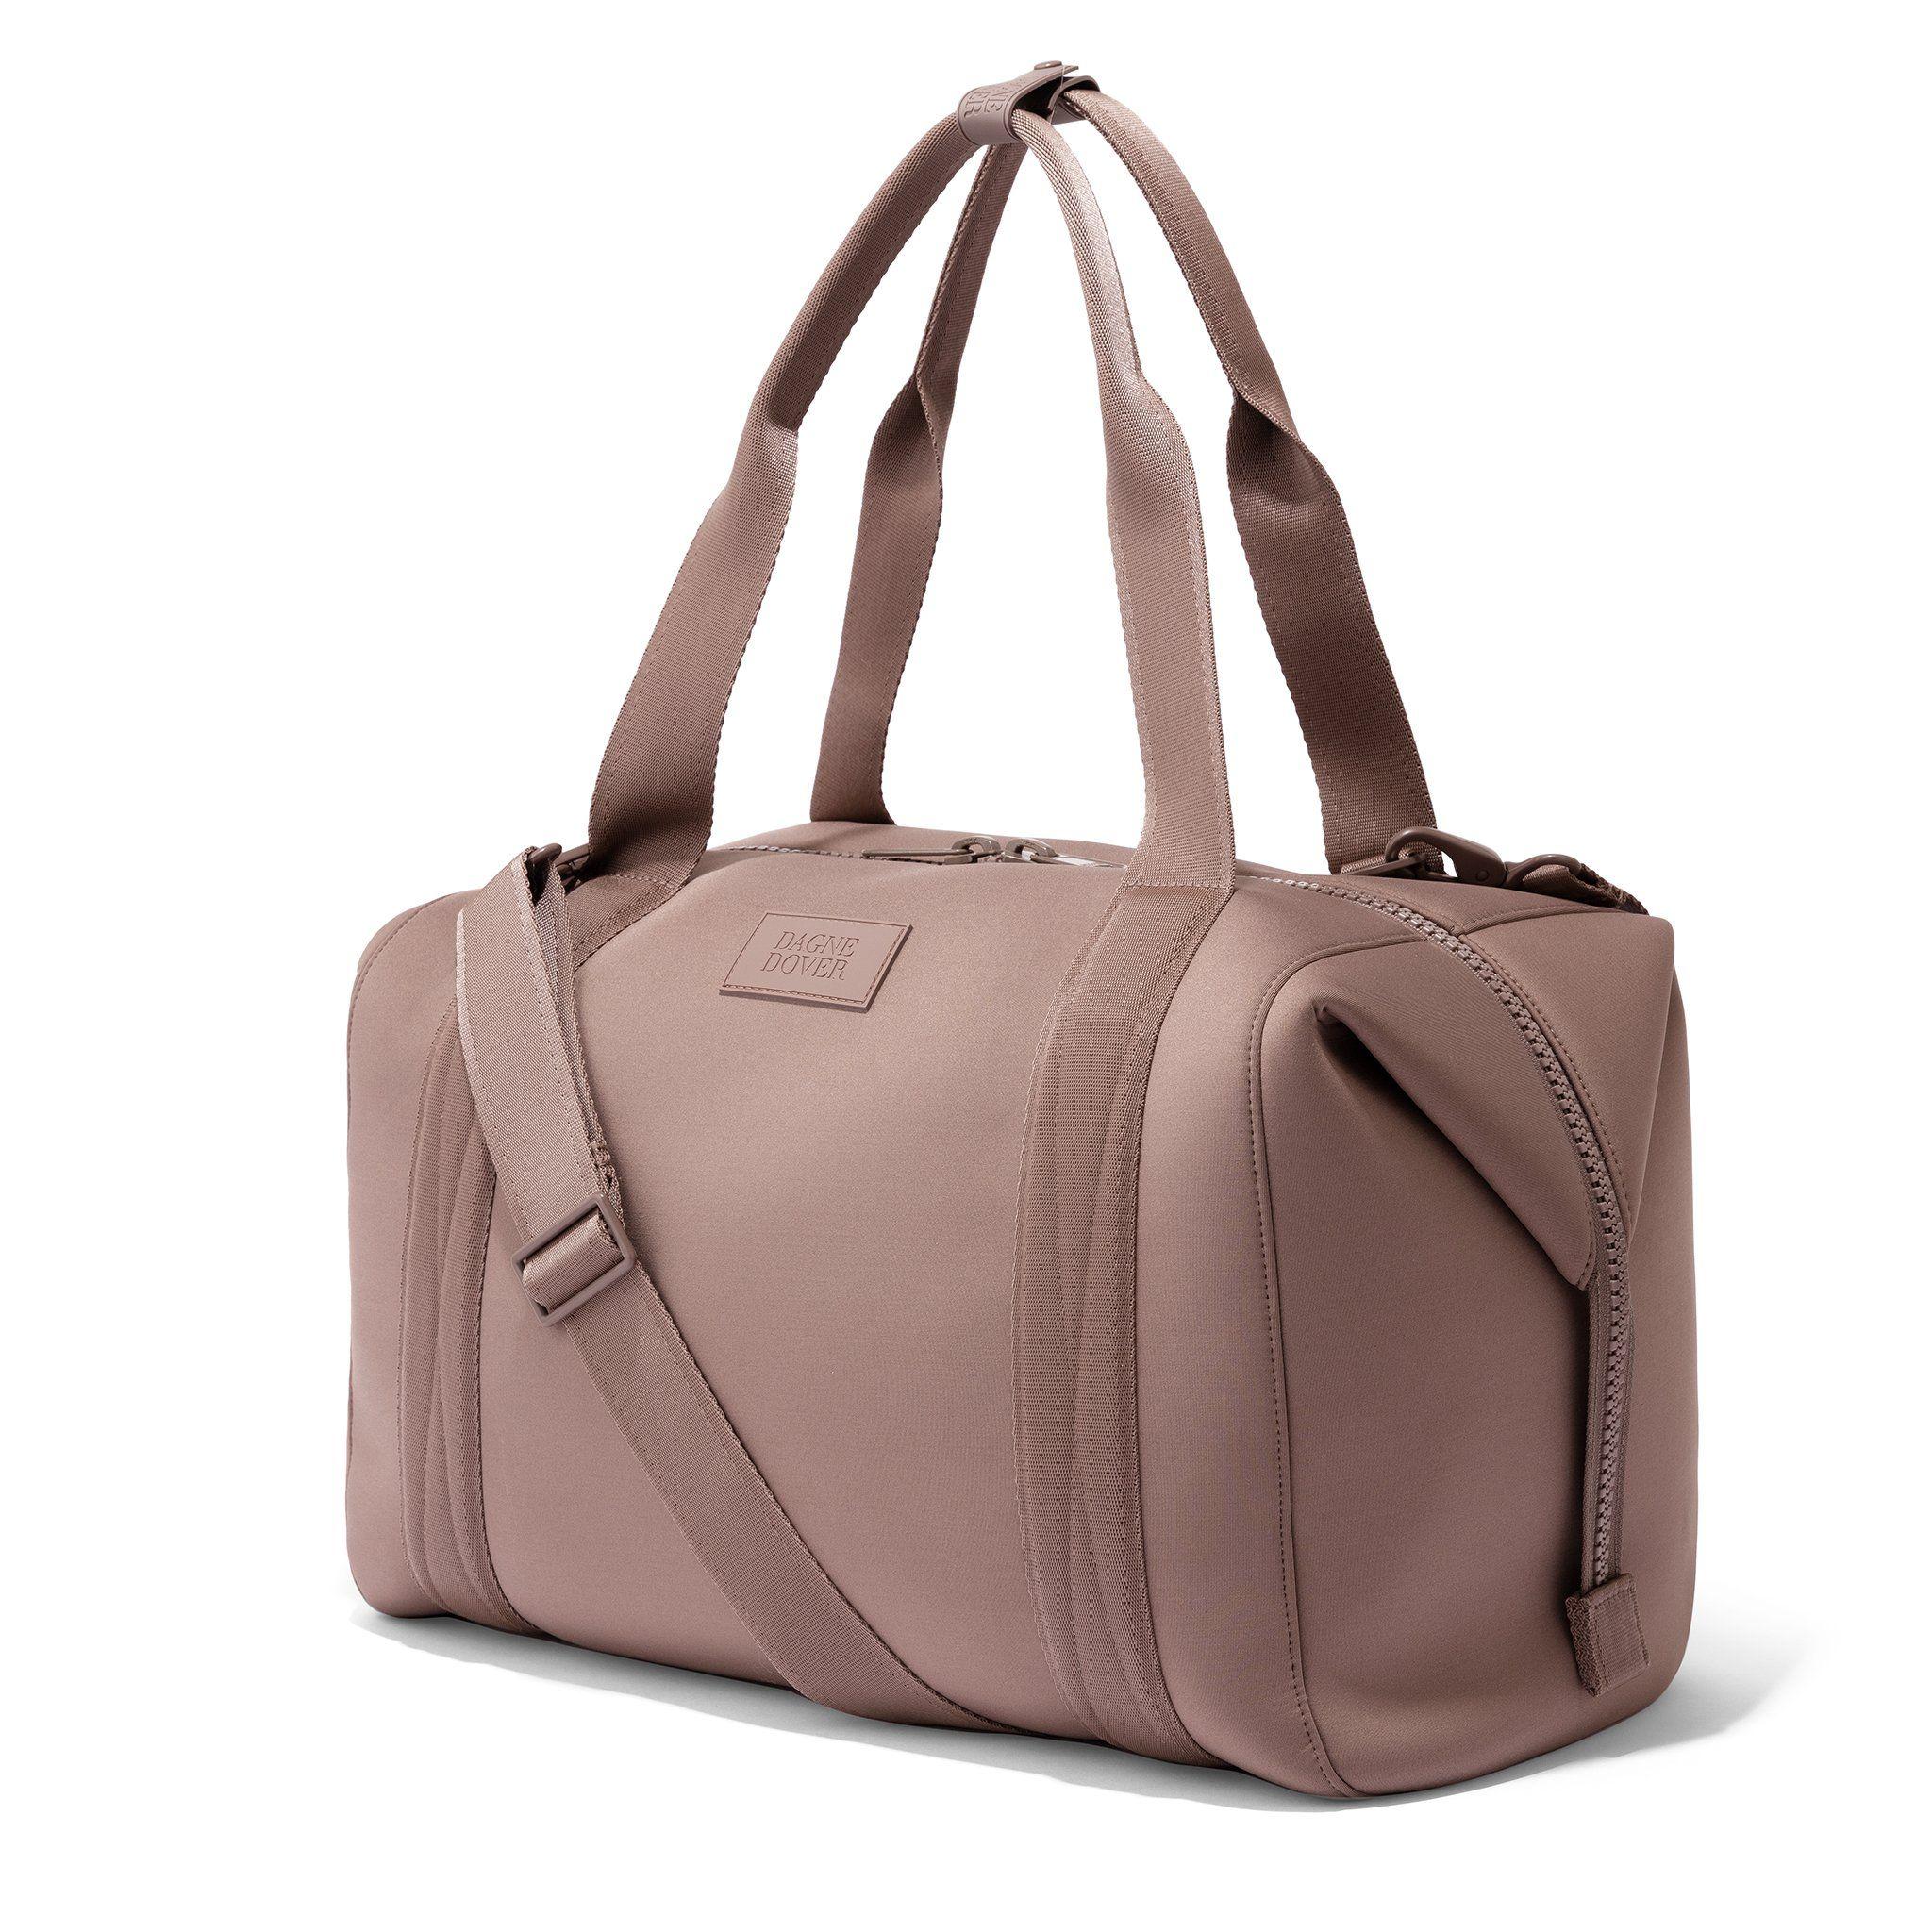 cd69937f76 Landon Carryall Duffle Bag